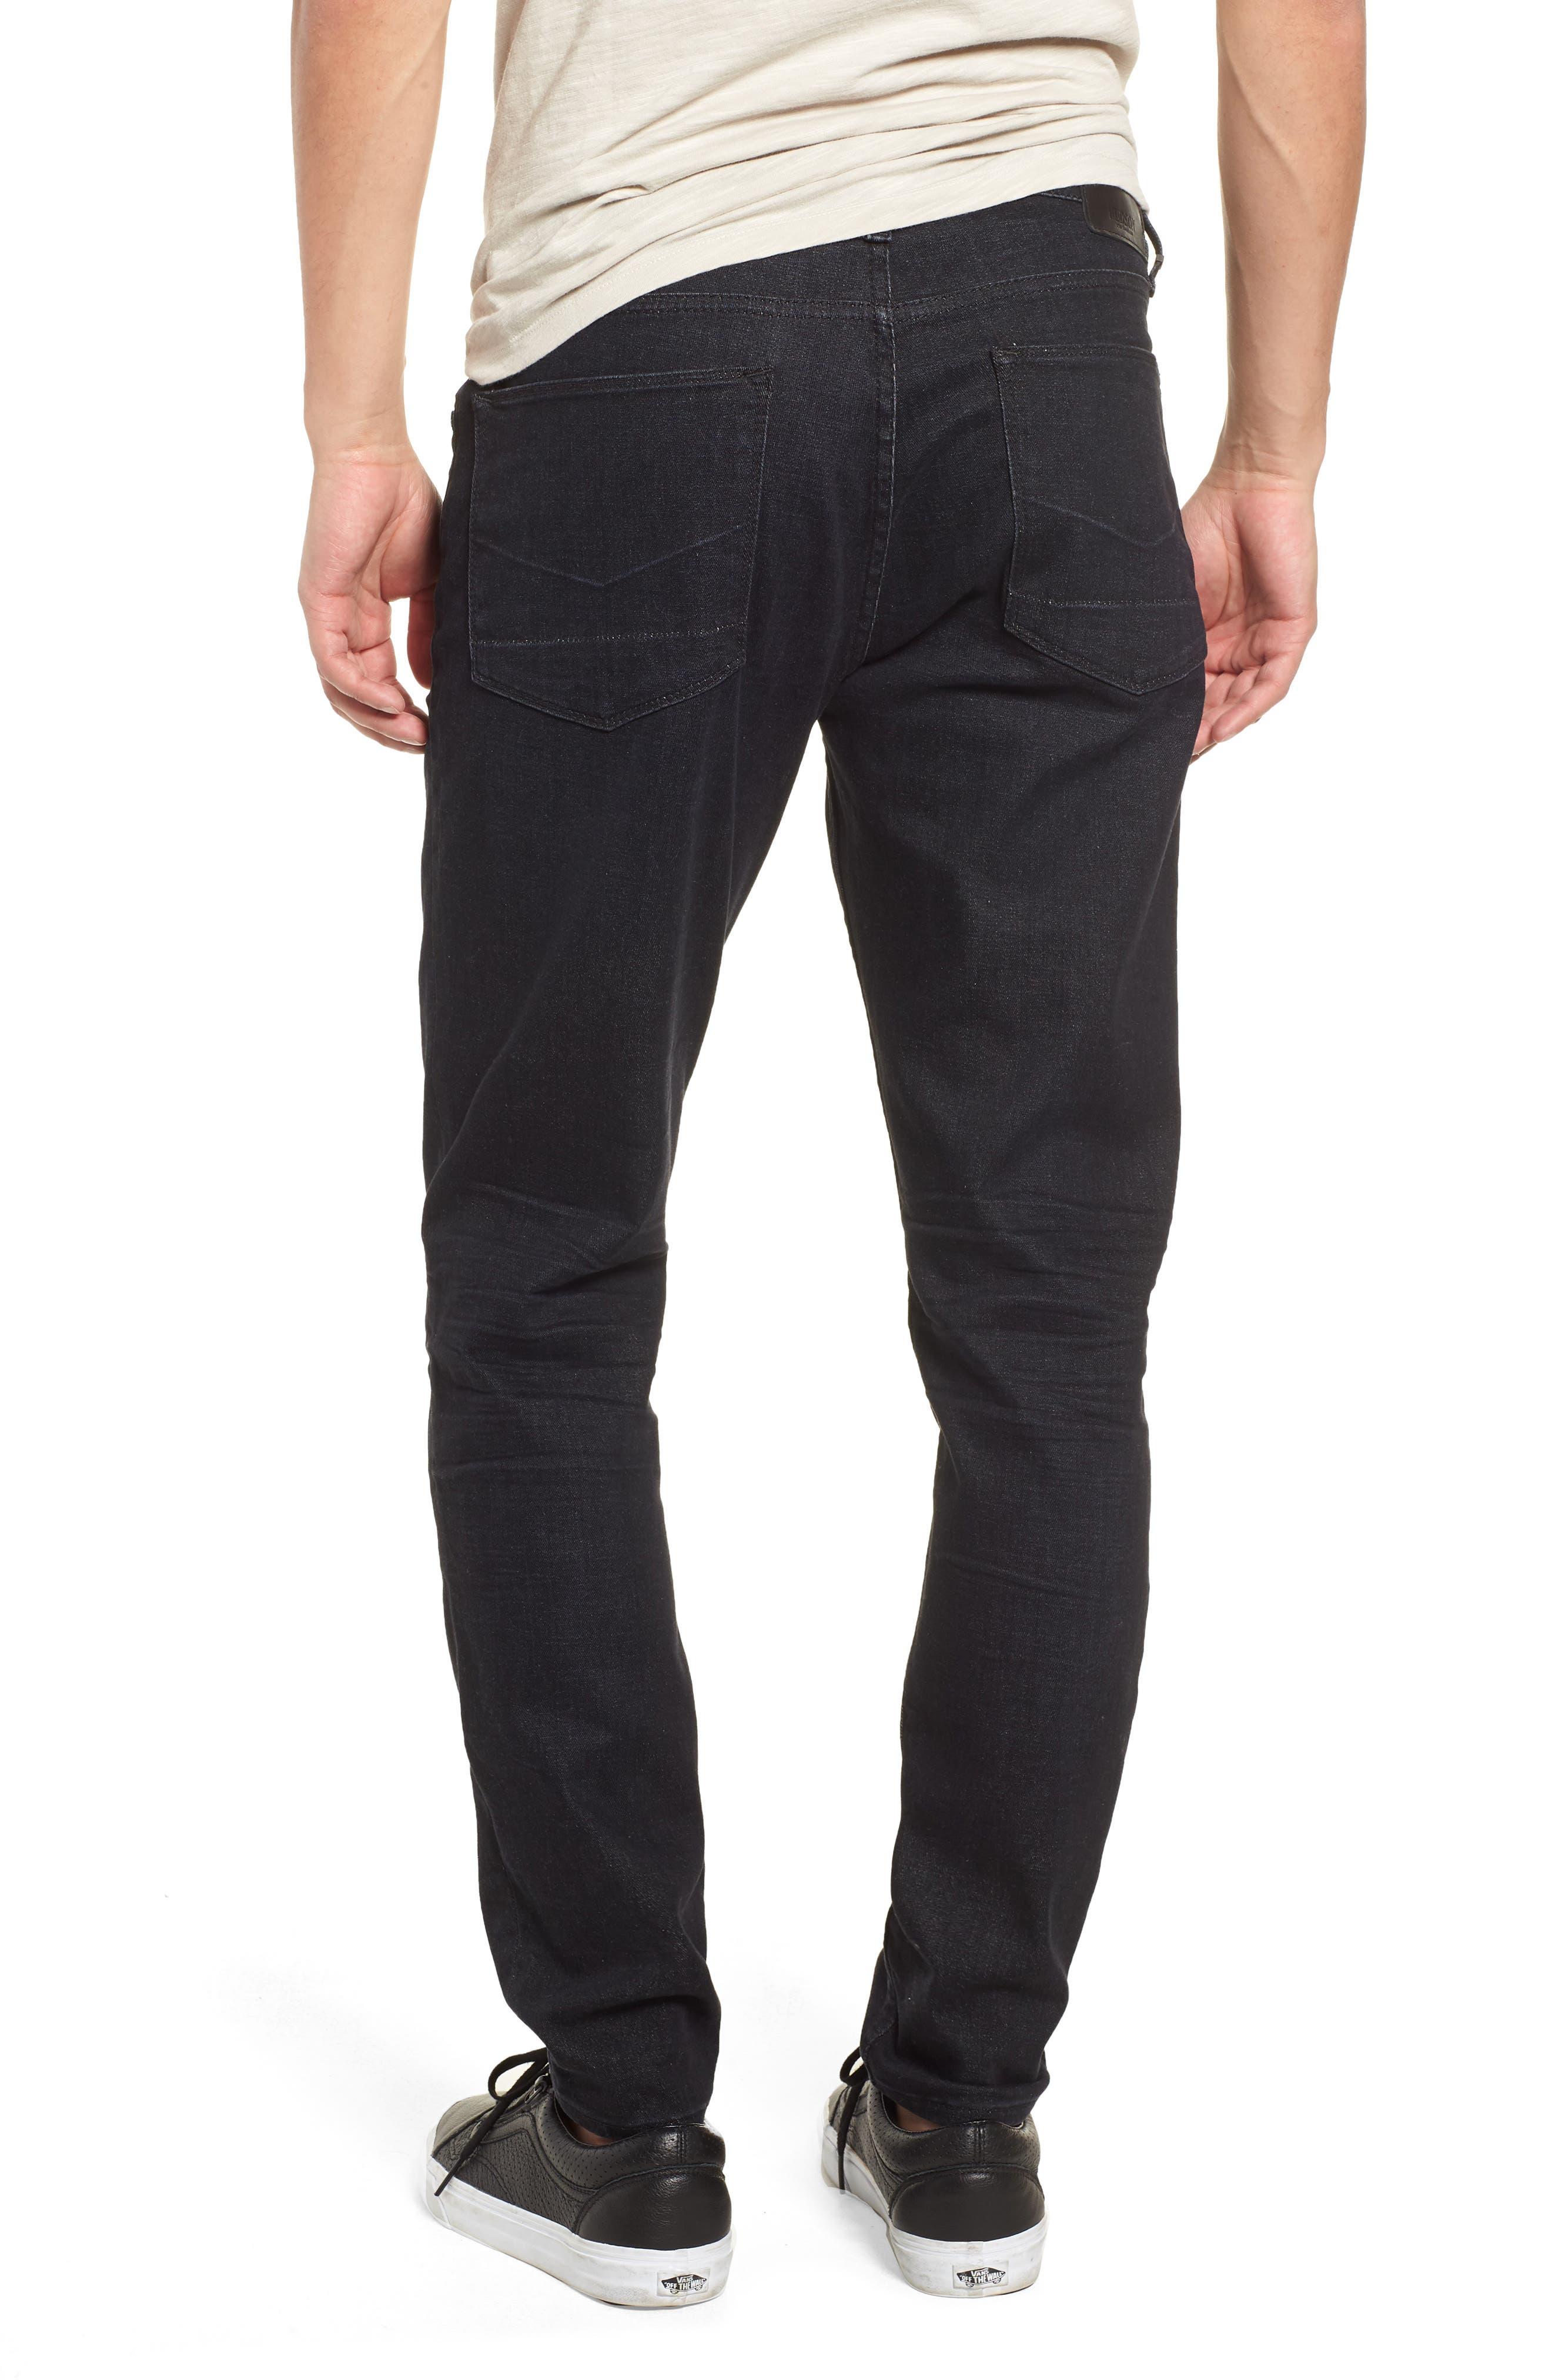 Zack Skinny Fit Jeans,                             Alternate thumbnail 2, color,                             001